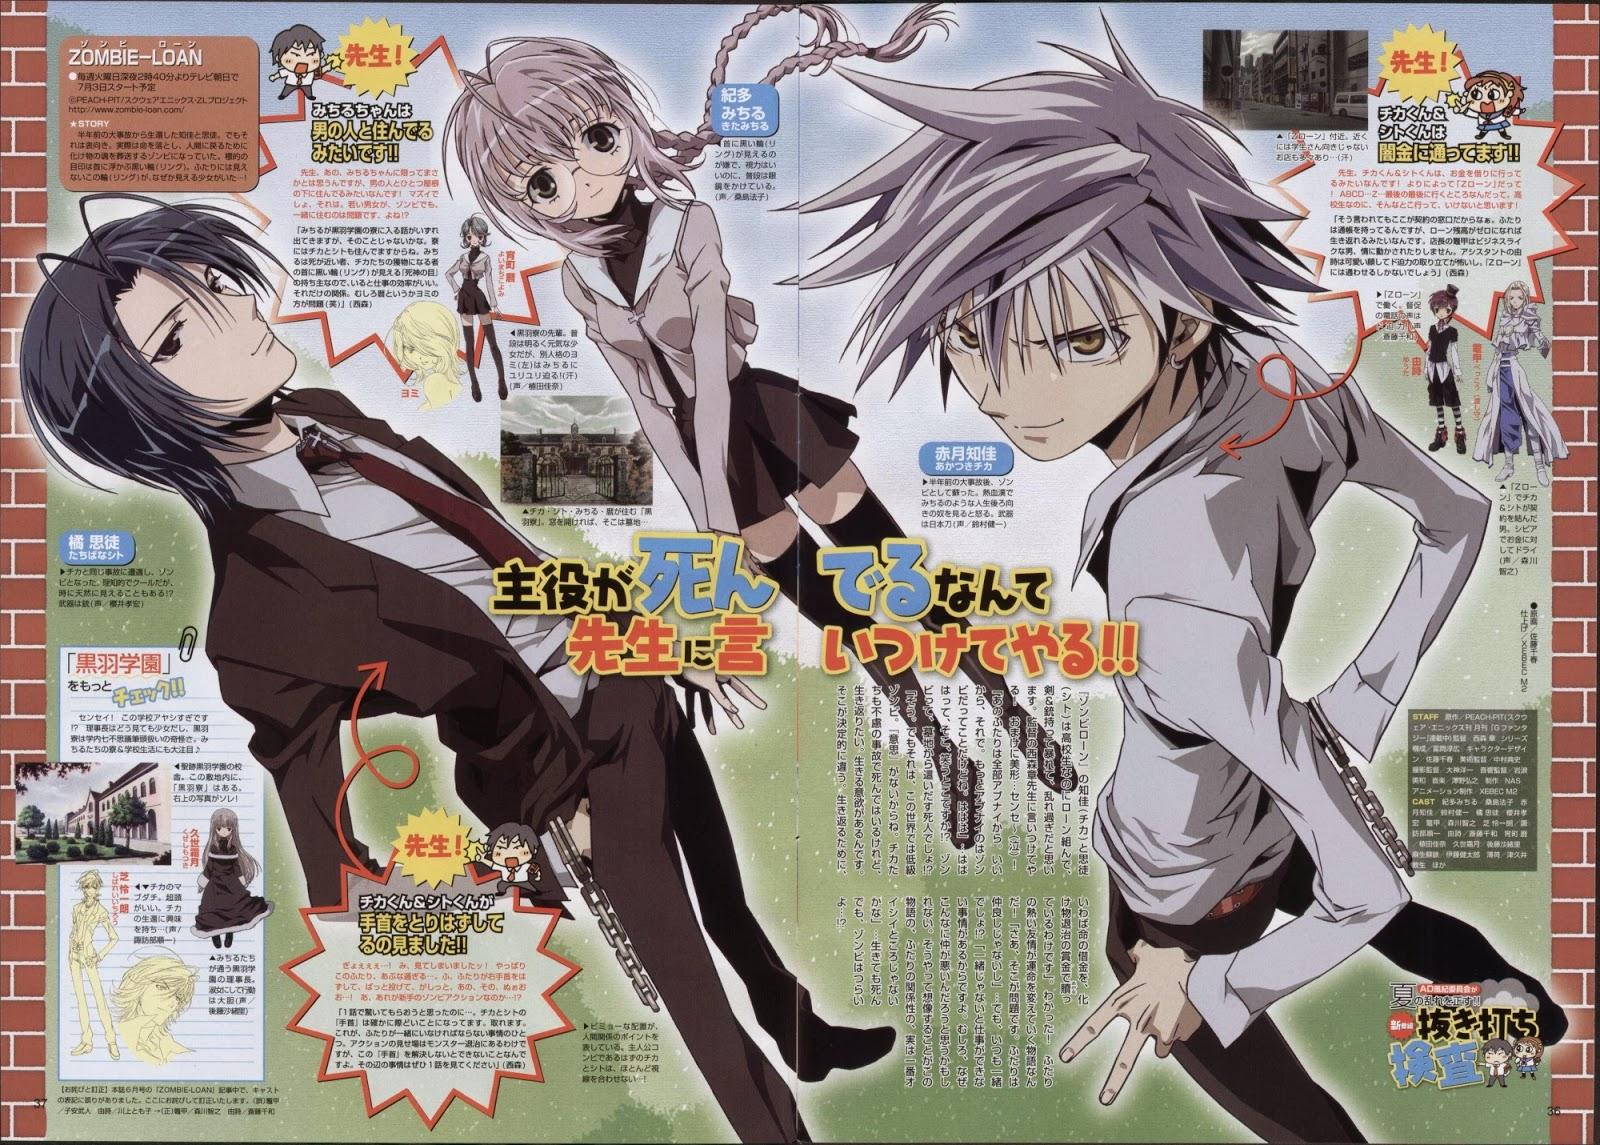 Moonlight Summoner's Anime Sekai: Zombie Loan ゾンビローン (Zonbi Rōn)